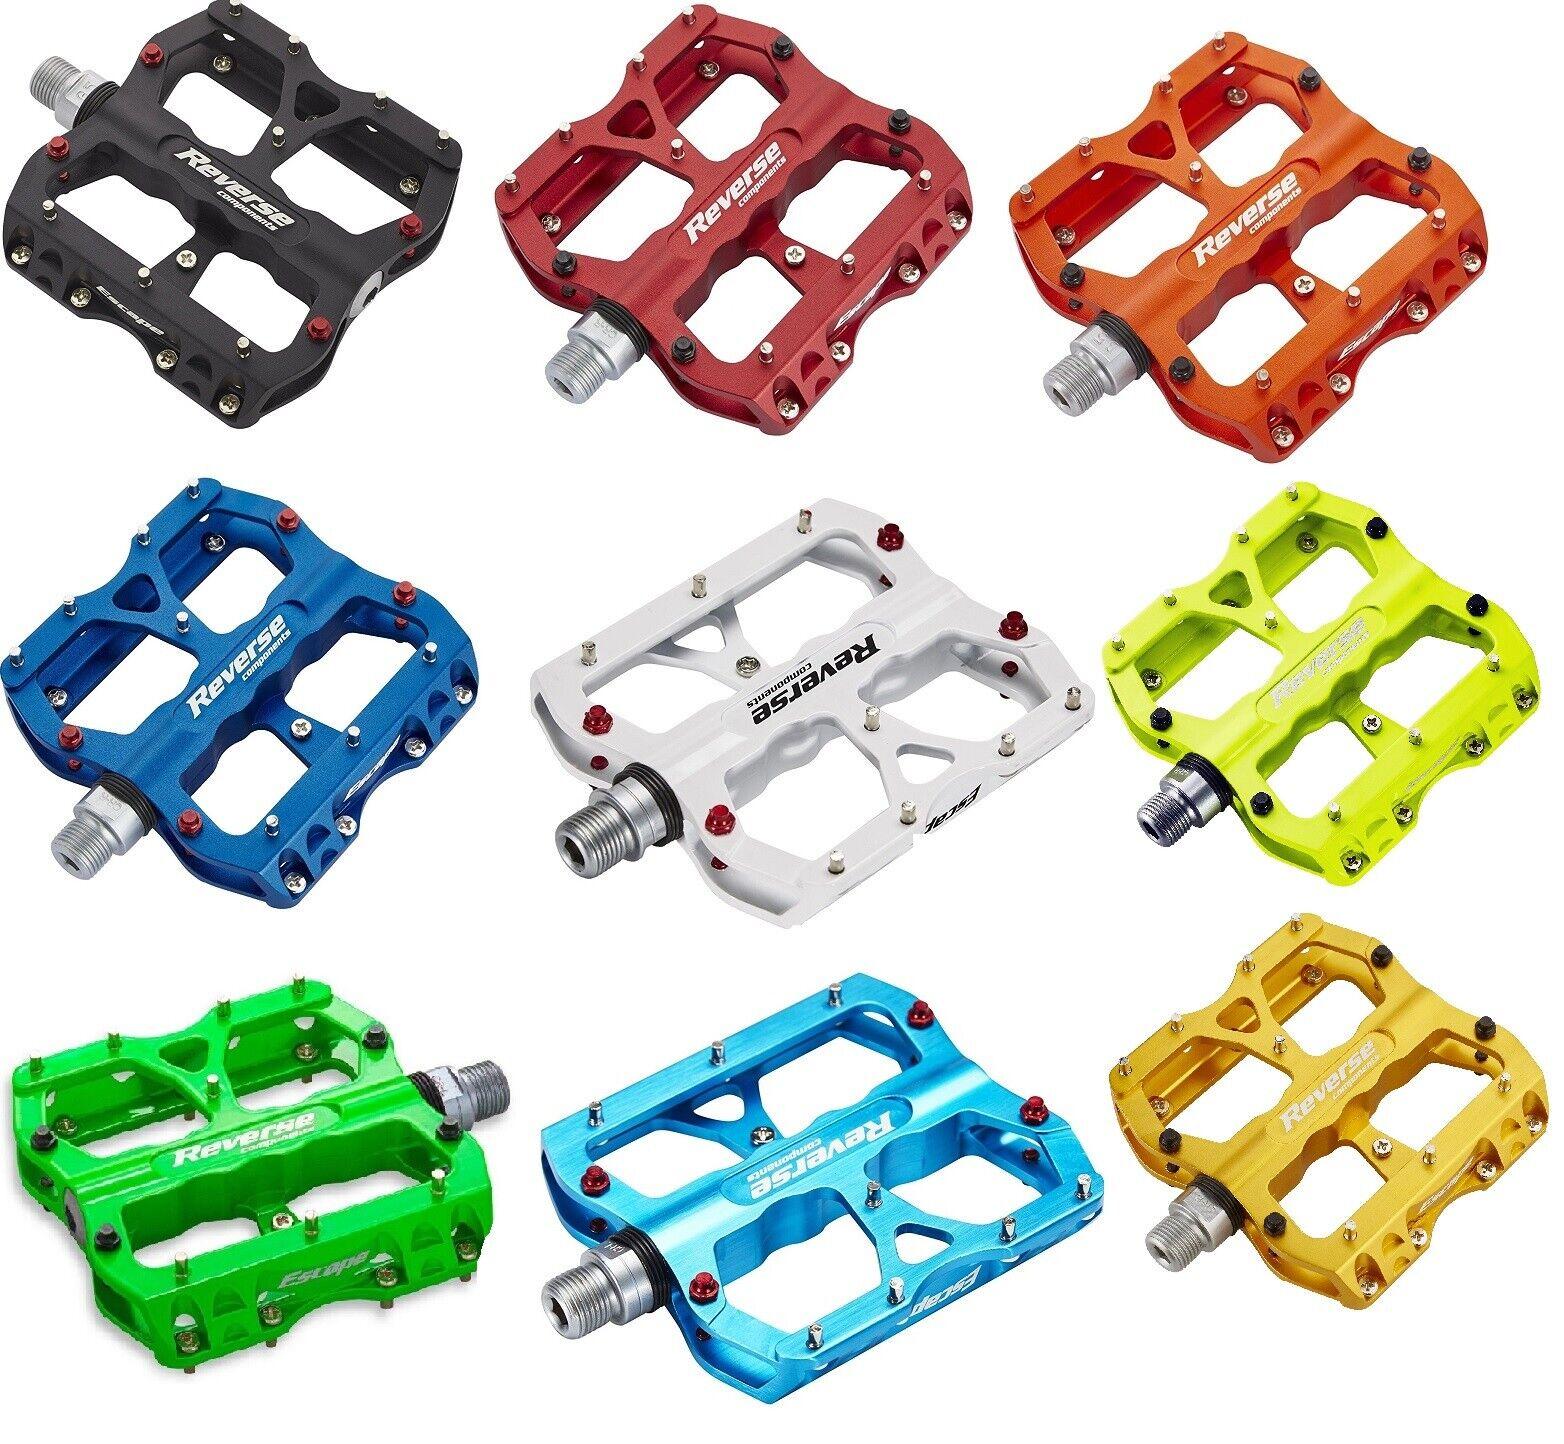 Reverse escape Flat pedal bicicleta  MTB DH Dirt bike Platform pedals pedales  tienda